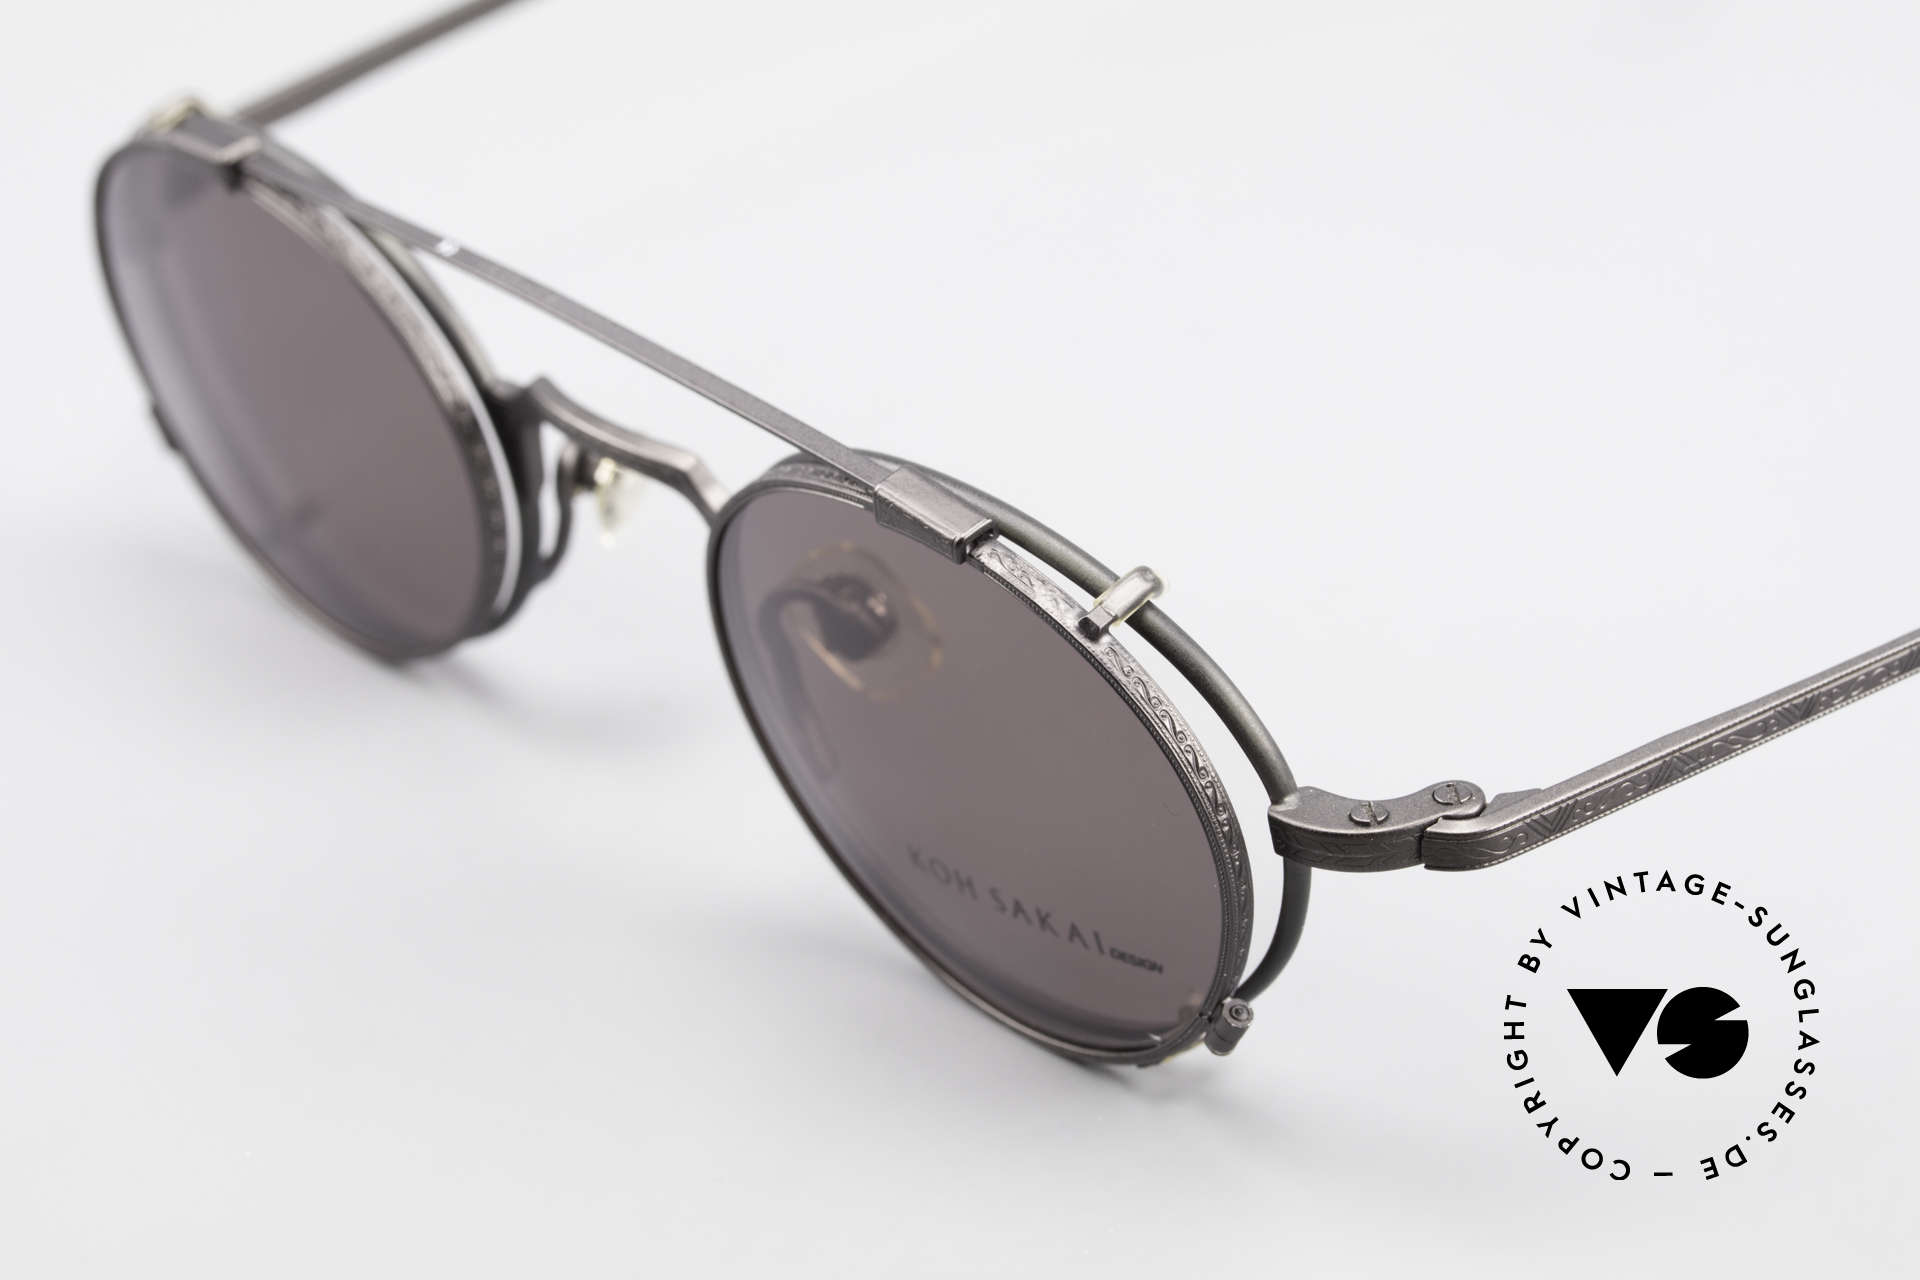 Koh Sakai KS9301 Identical Oliver Peoples Eyevan, made in the same factory like Oliver Peoples & Eyevan, Made for Men